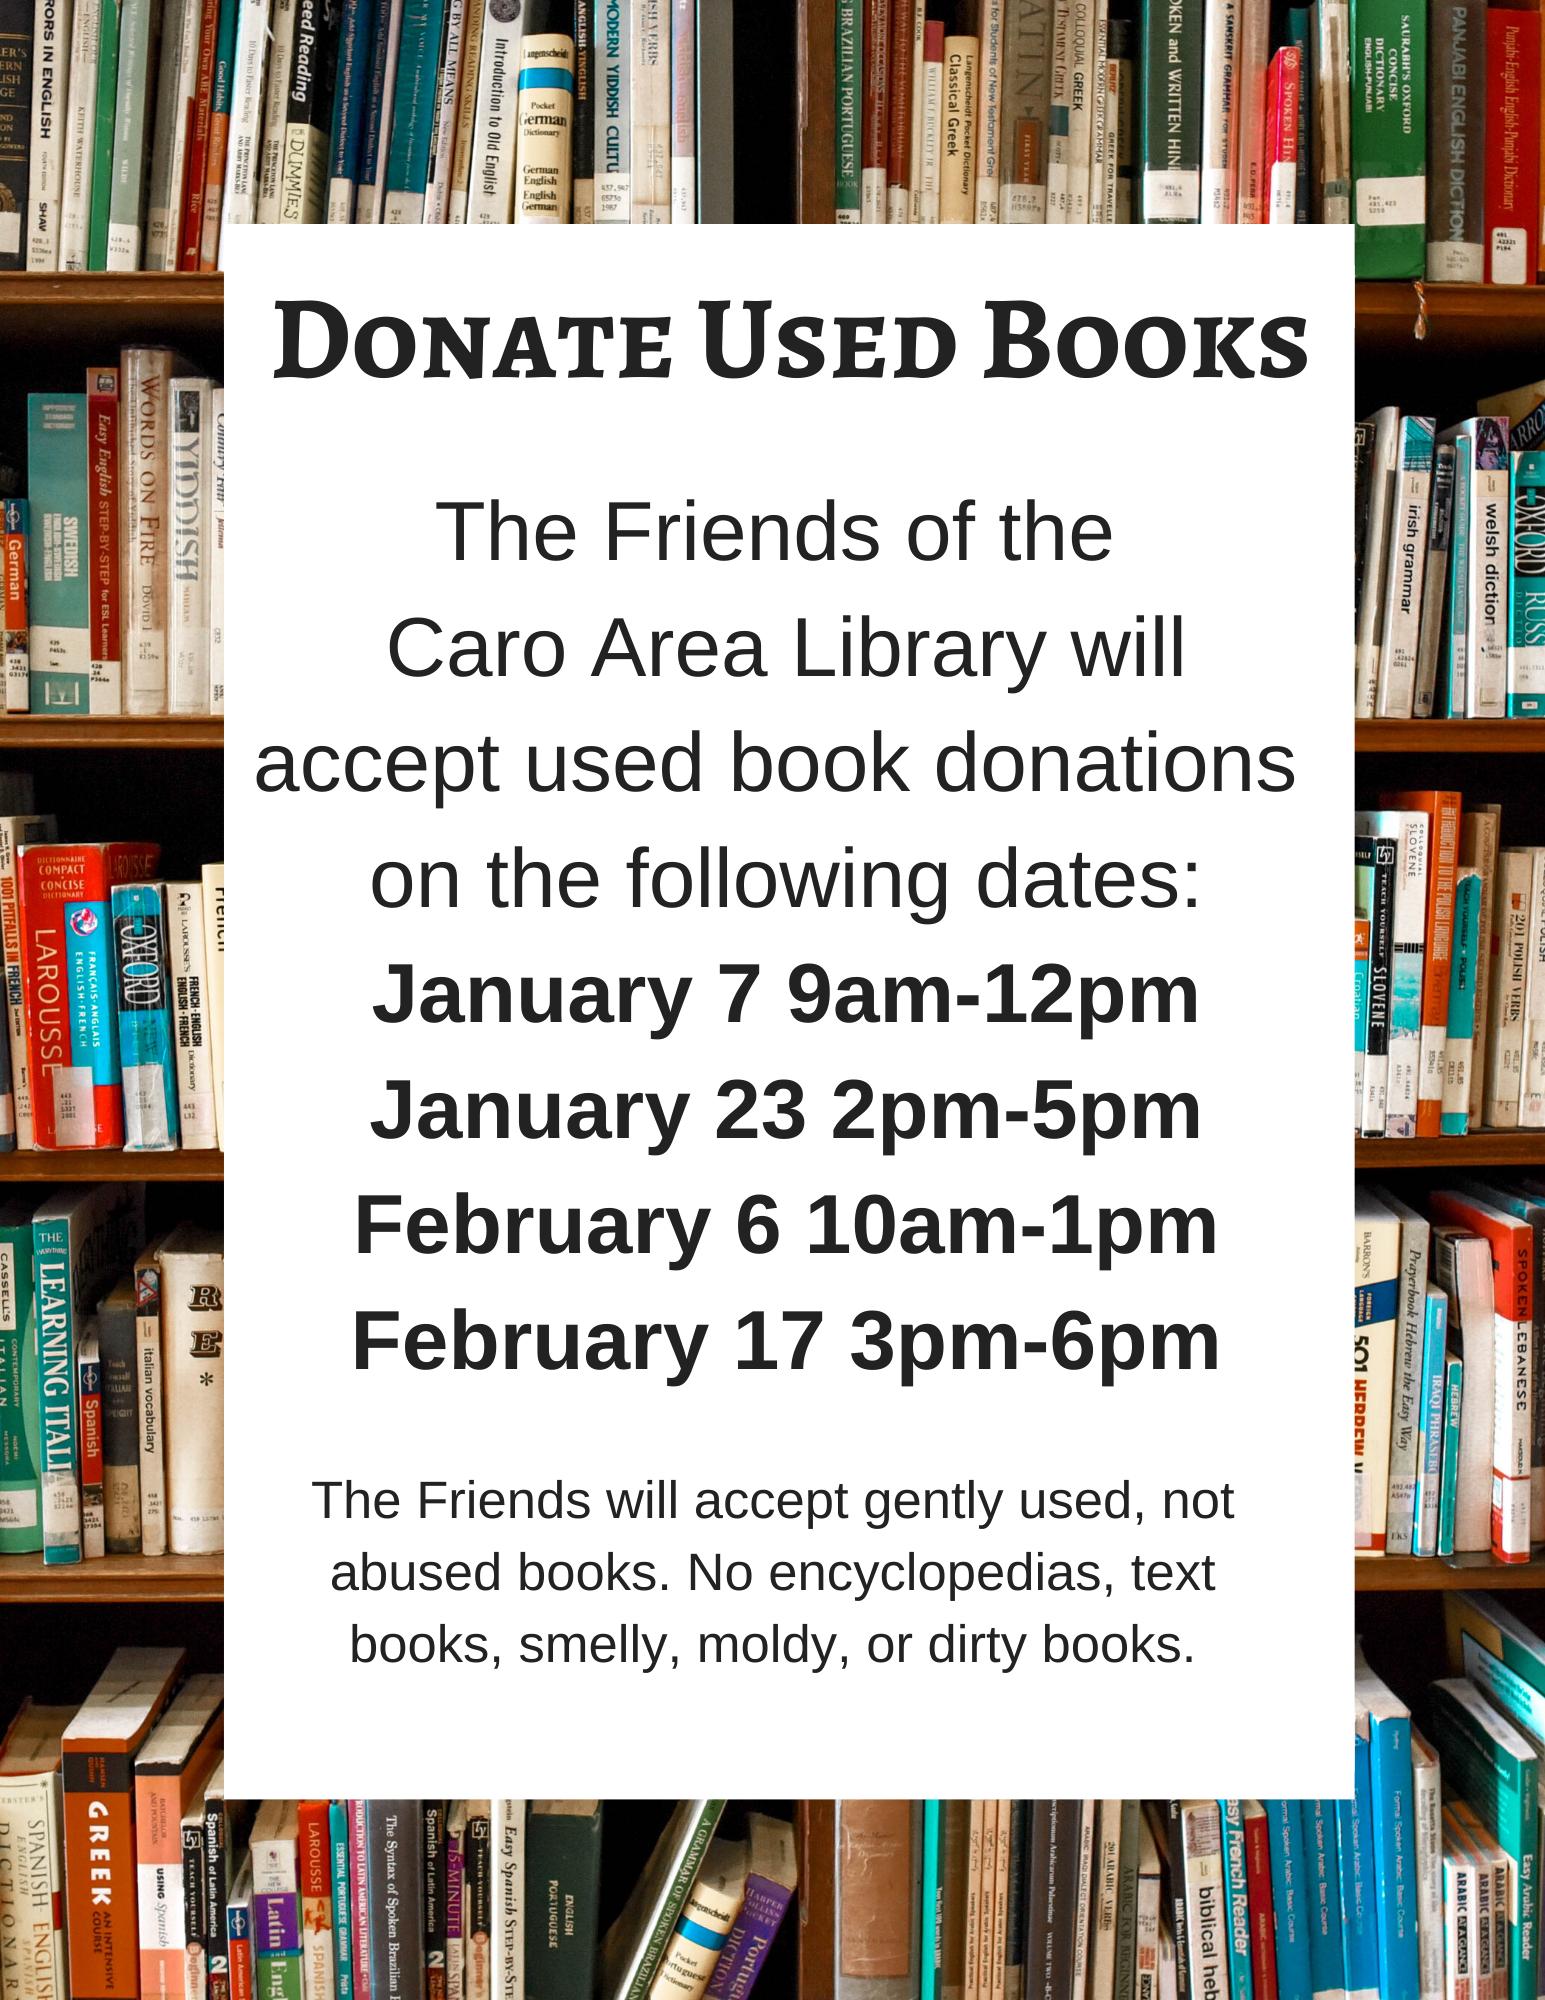 Donate Used Books